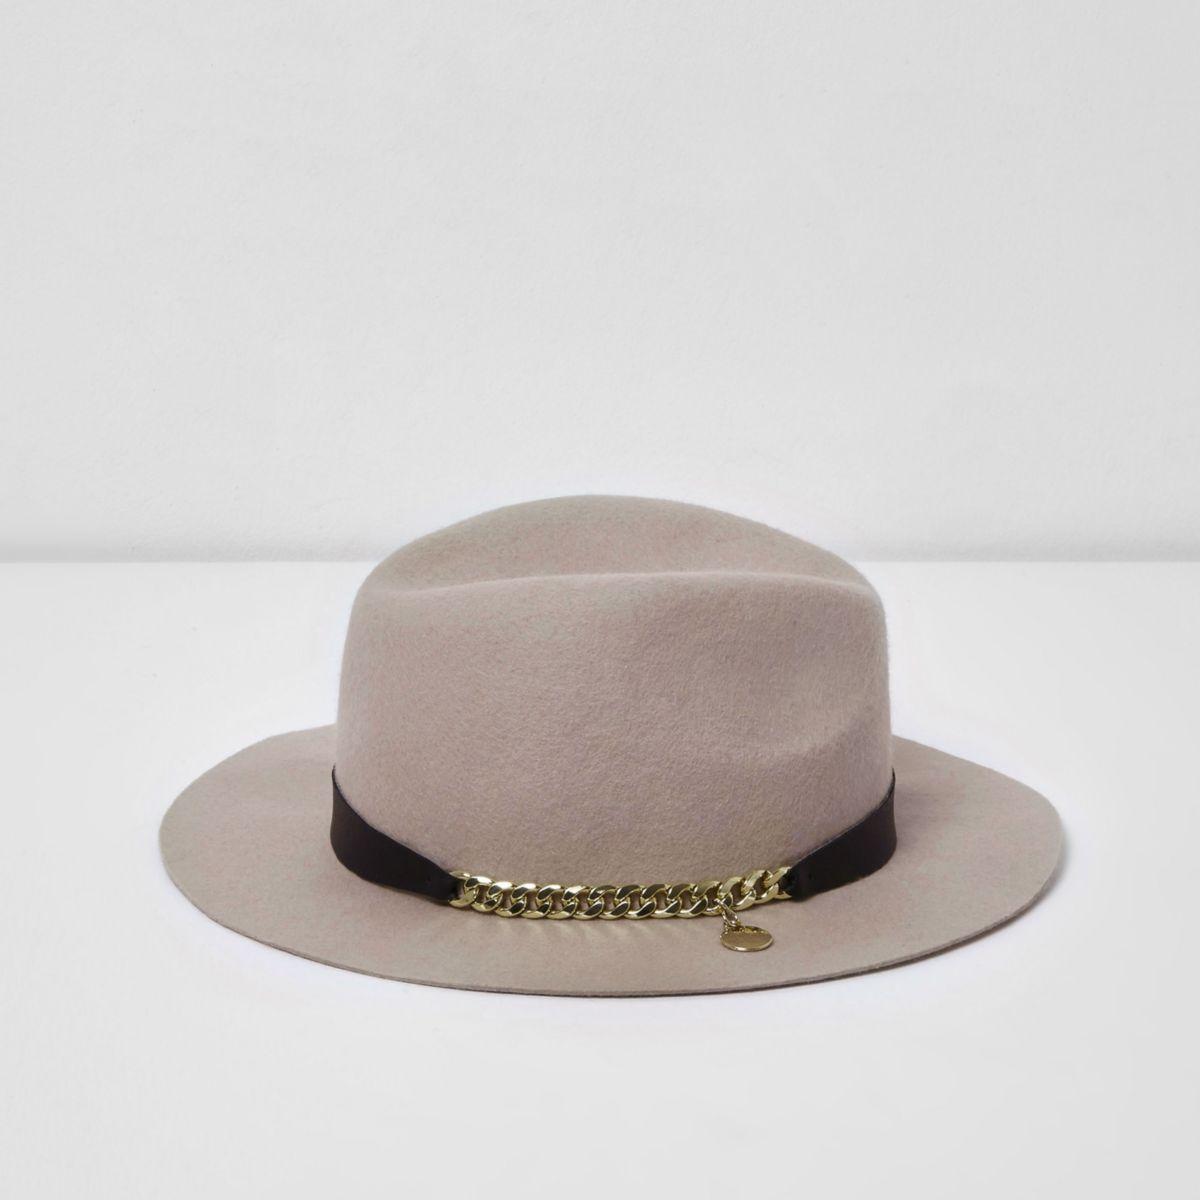 RI Studio – Chapeau fedora rose avec galon chaîne pour fille